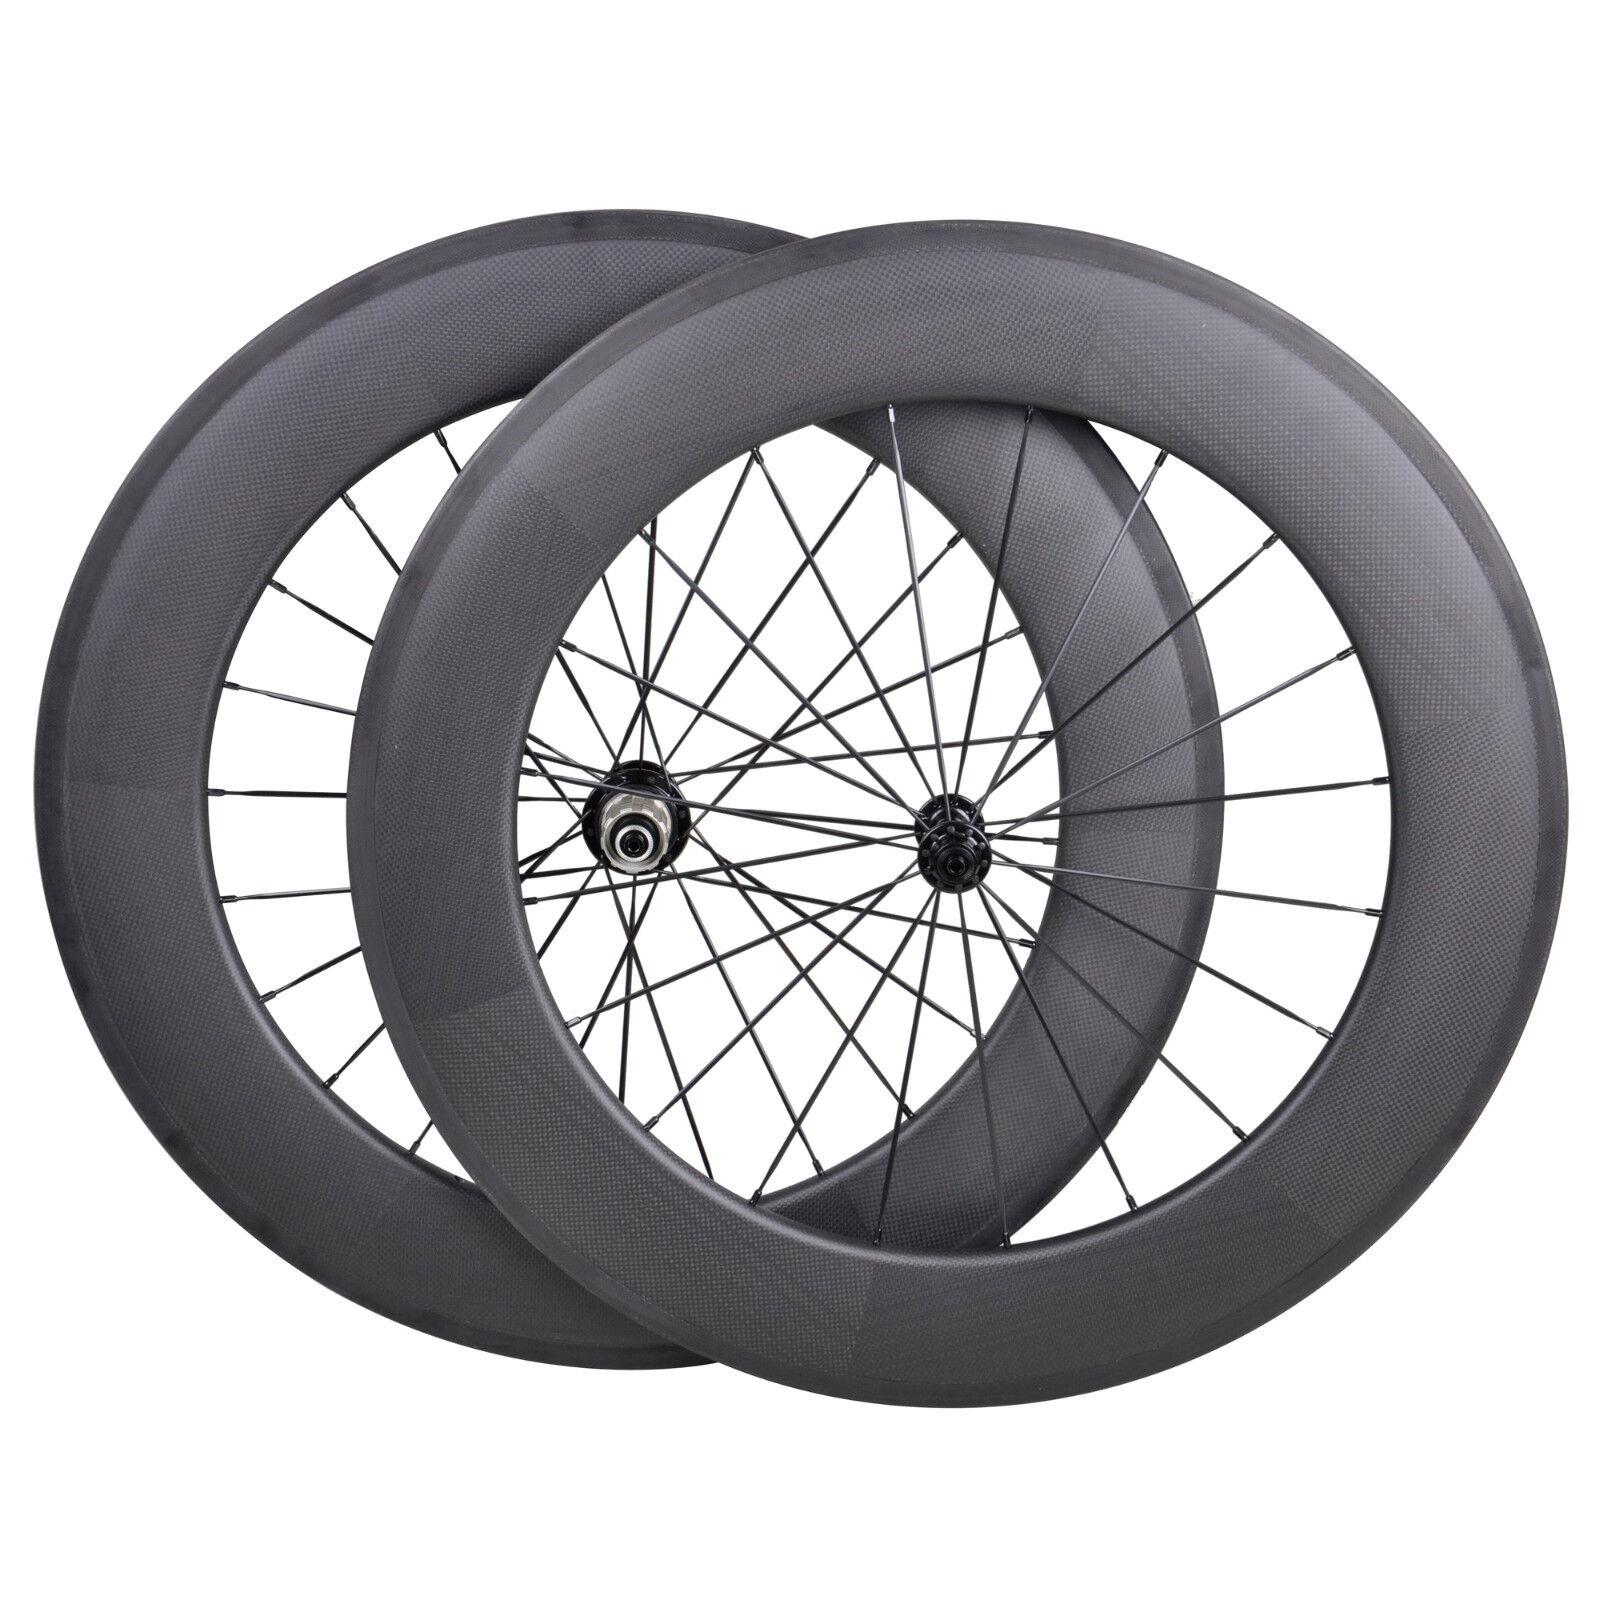 88mm Carbon Wheelset Clincher Road Bicycle Rim Tape 700C 3k Matt Powerway R13